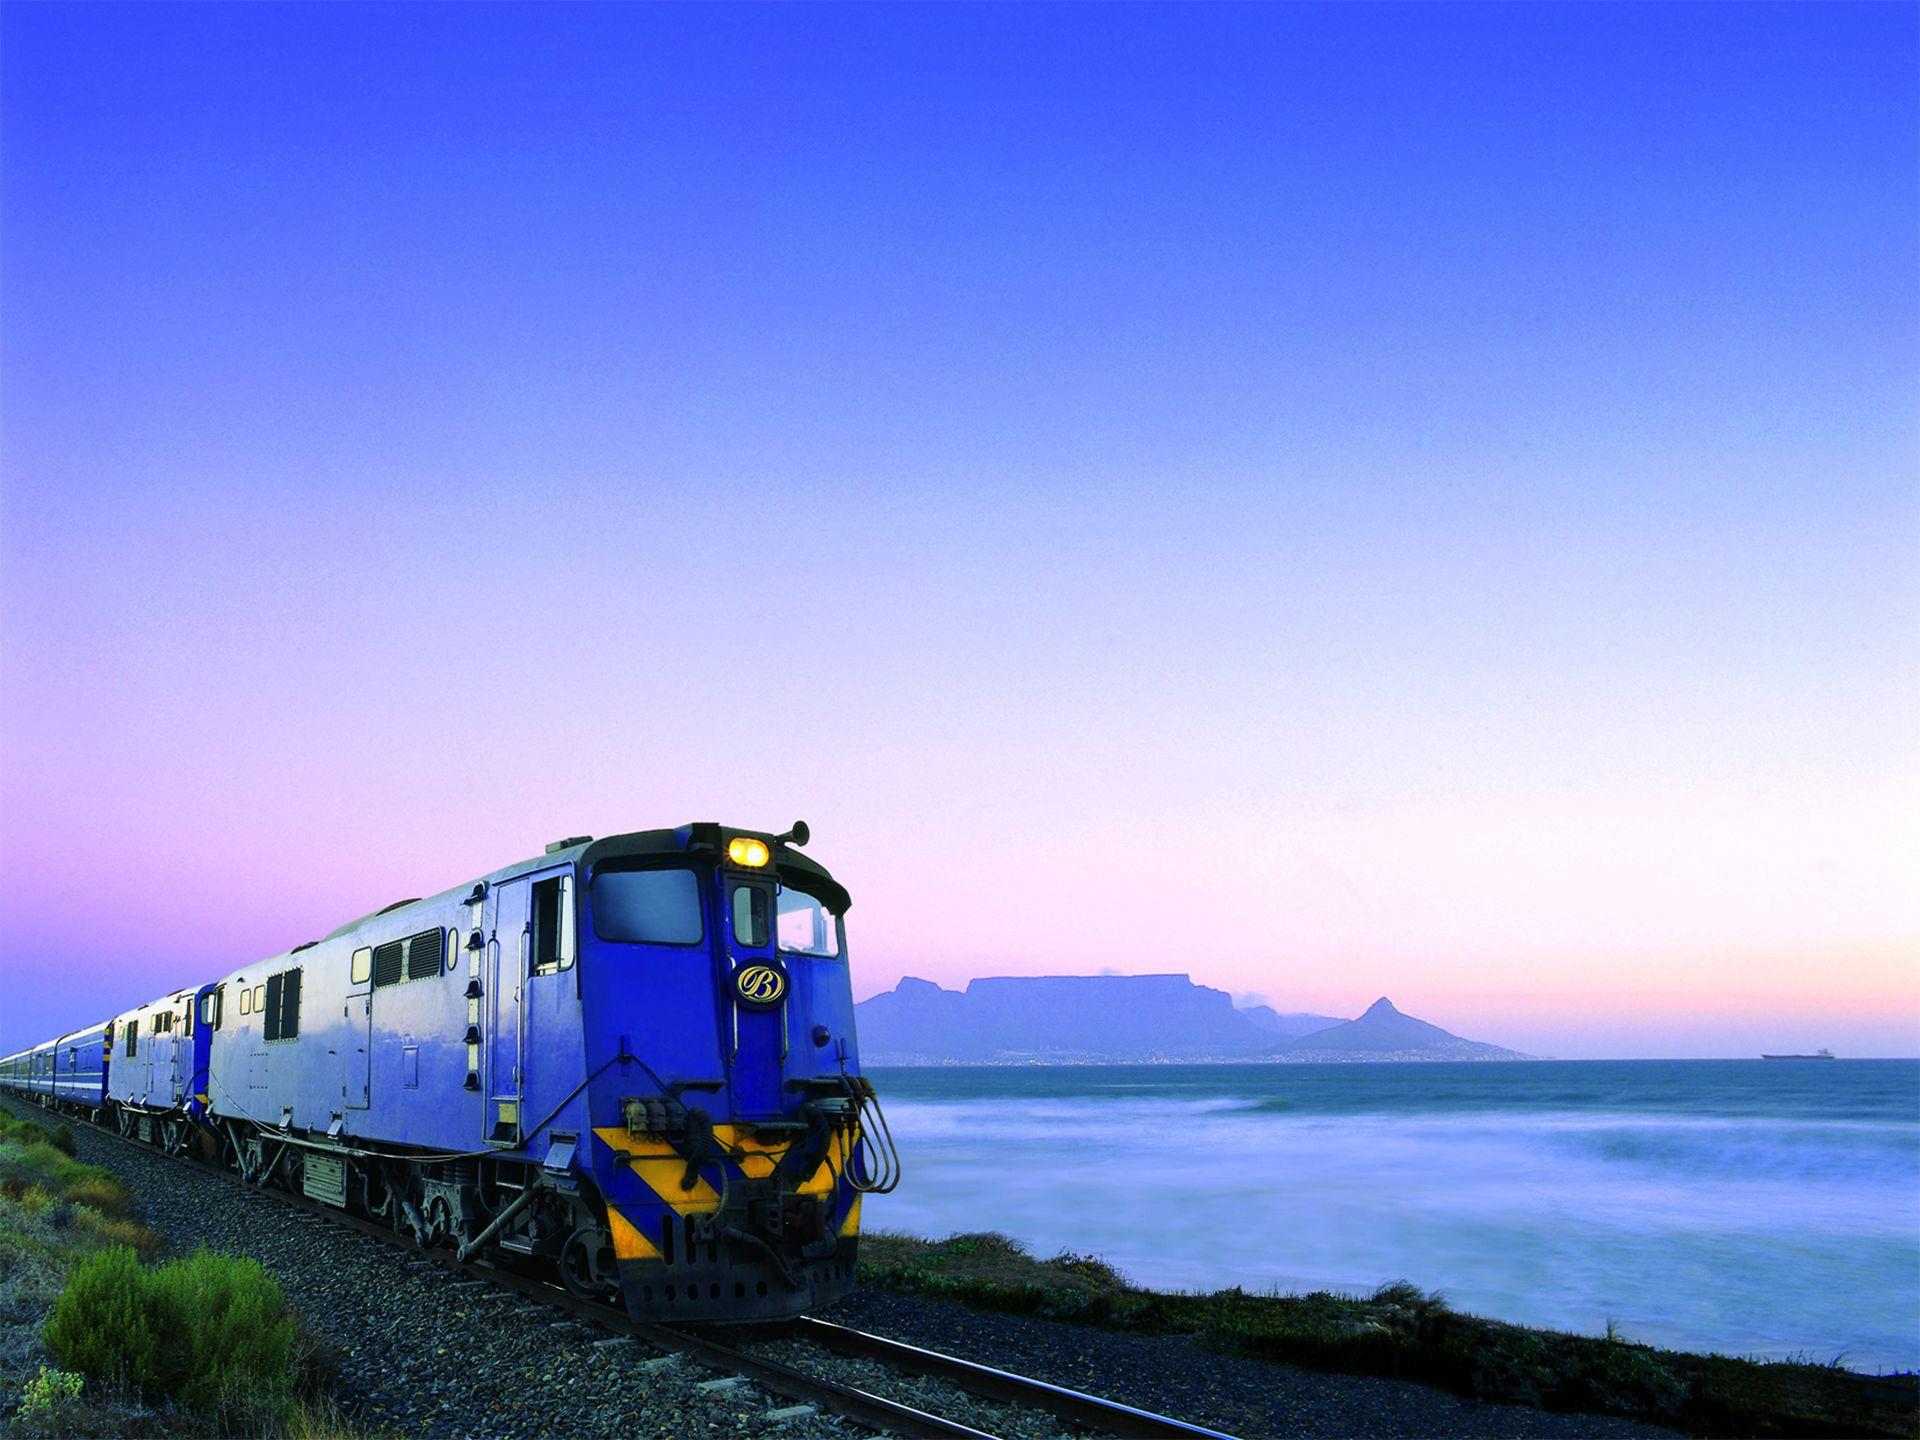 Trains Background